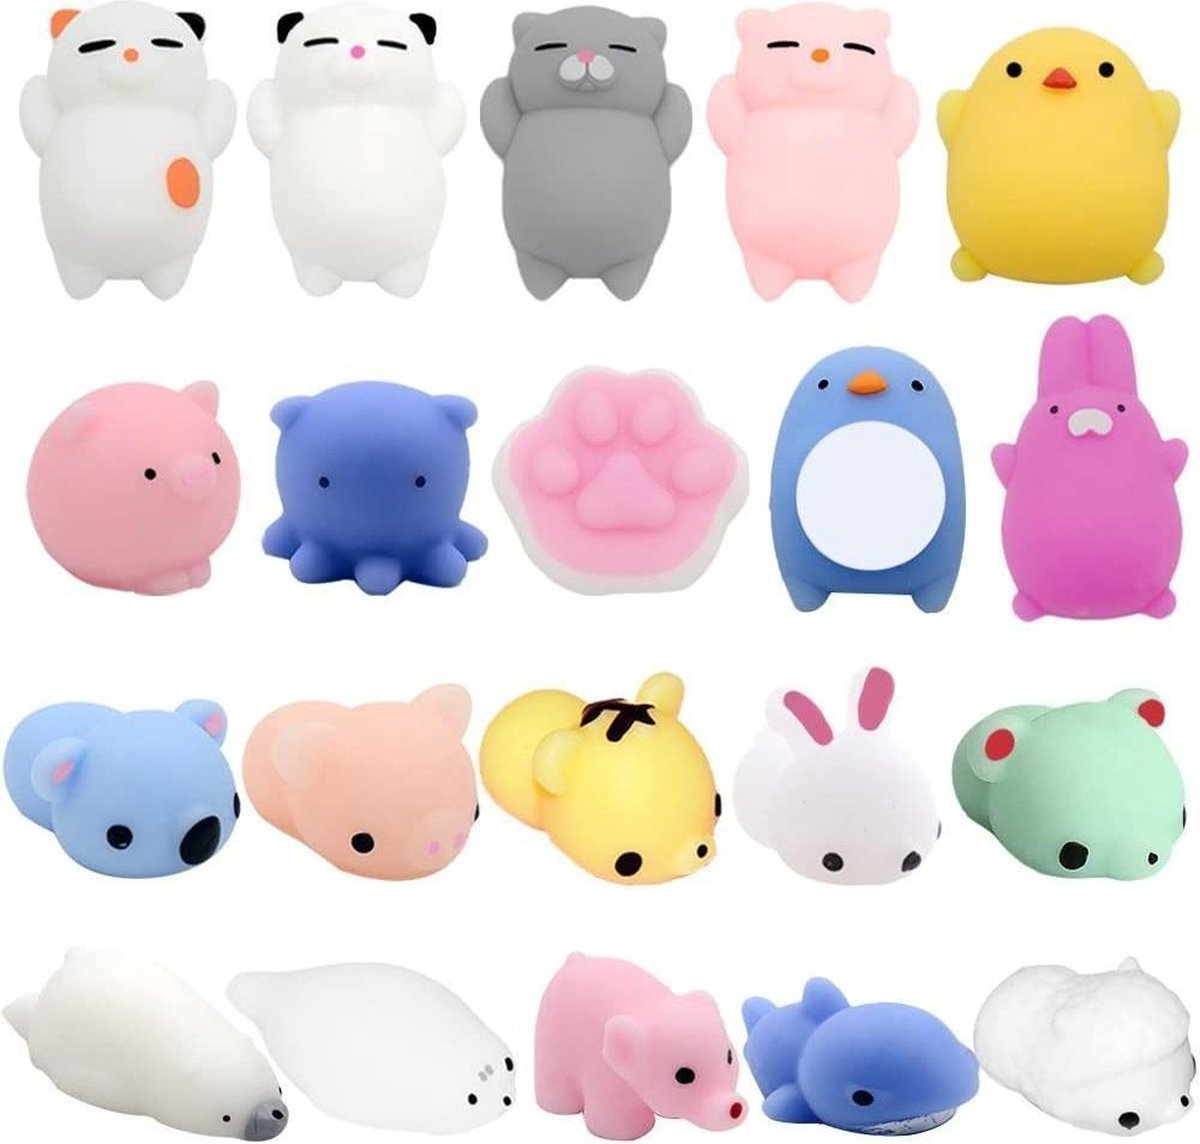 fidget toys - mochi Squishy - pakket van 10 stuks - squishy dieren - animal - mochies